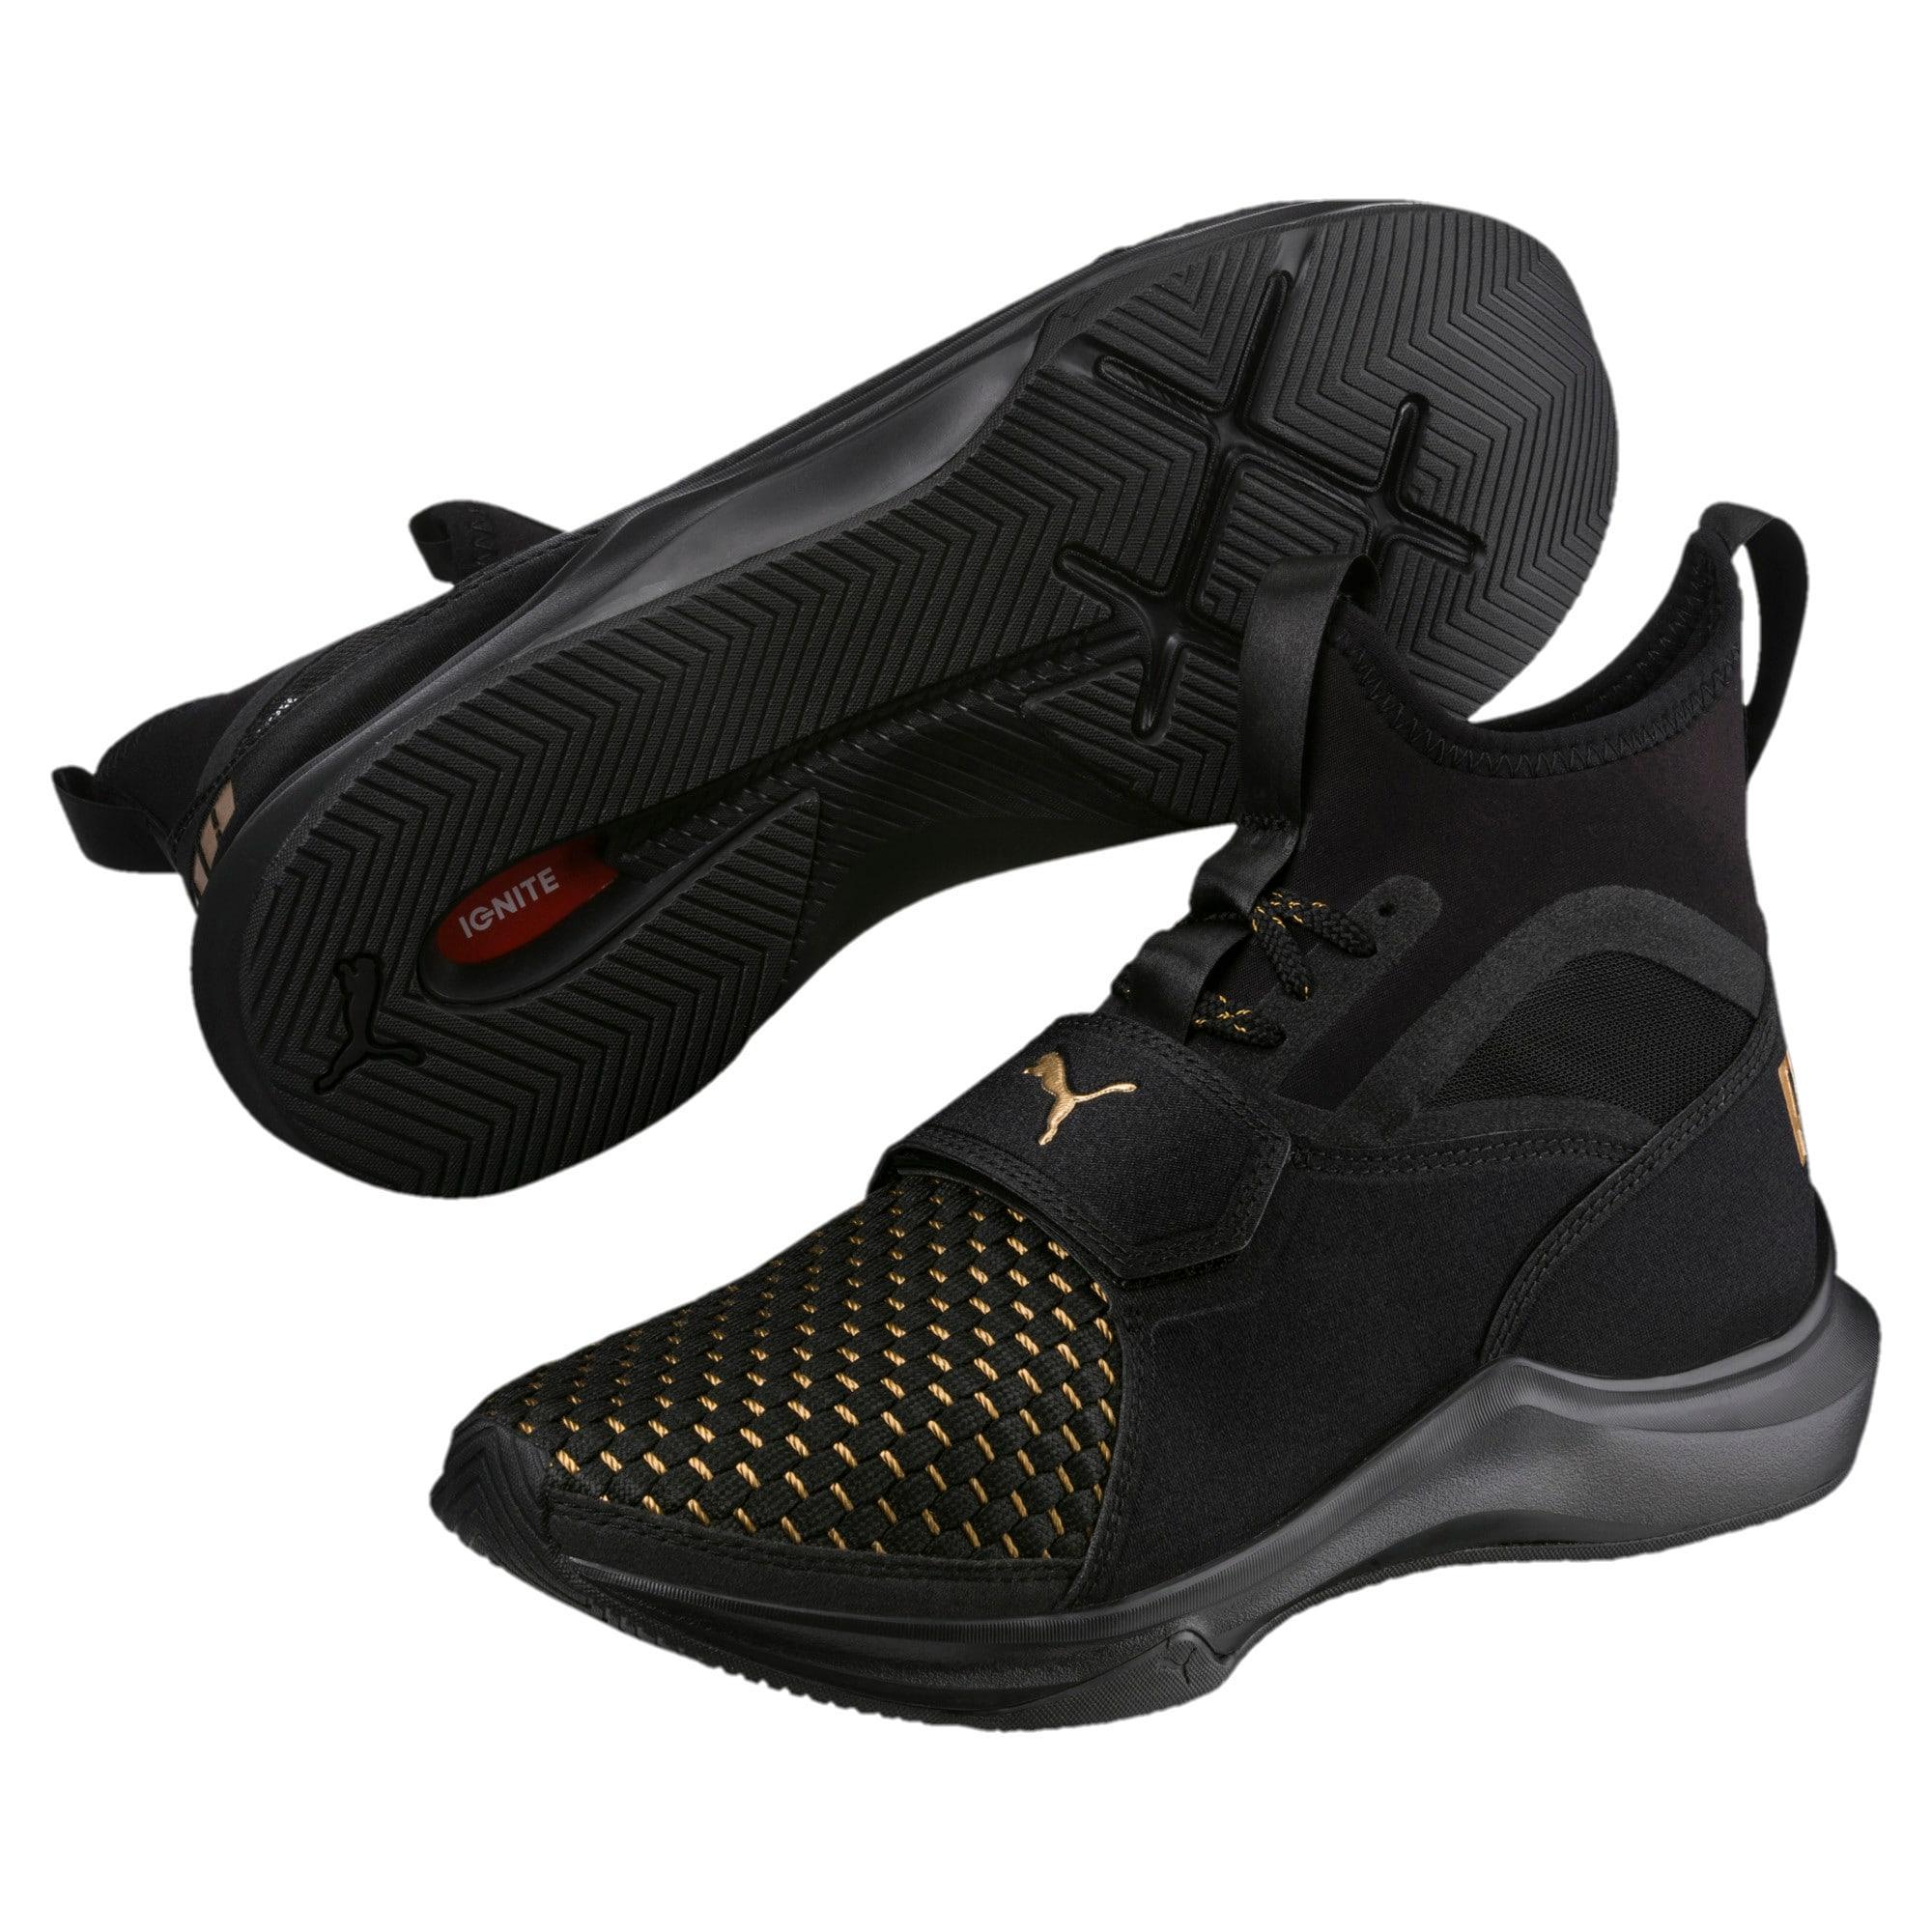 Thumbnail 6 of Phenom Varsity Women's Training Shoes, Puma Black-Puma Black, medium-IND